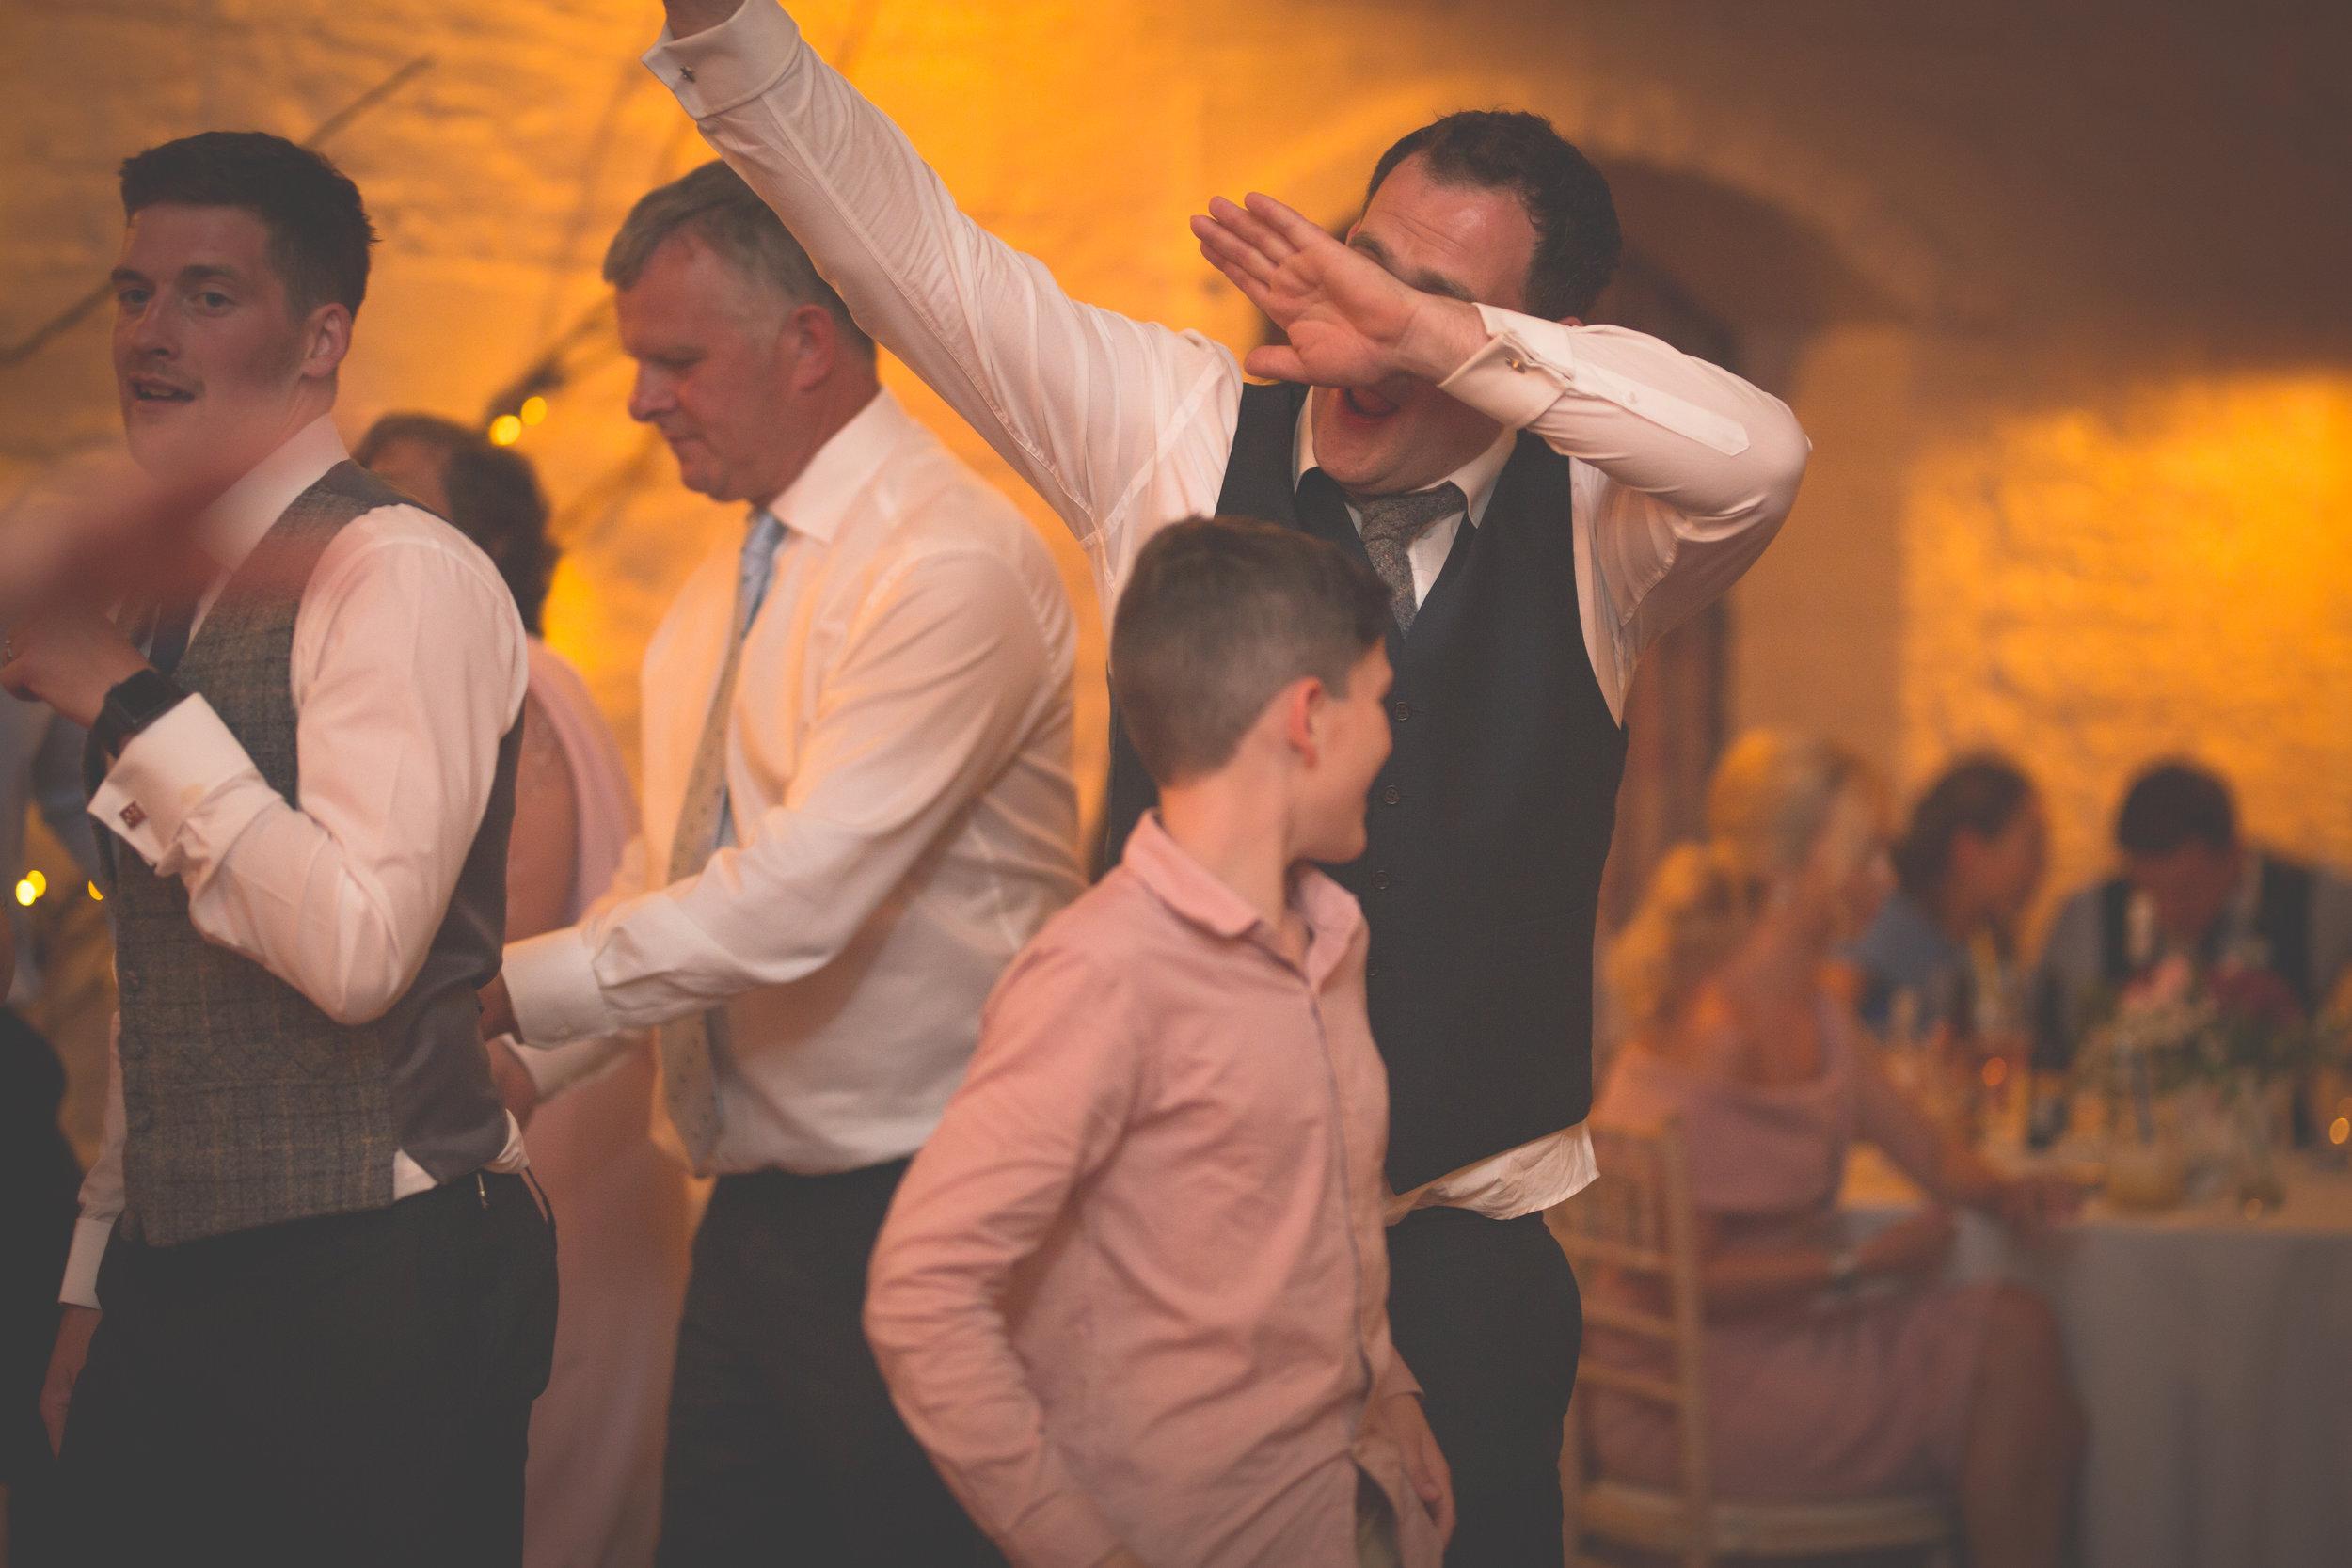 Brian McEwan Wedding Photography | Carol-Annee & Sean | The Dancing-73.jpg